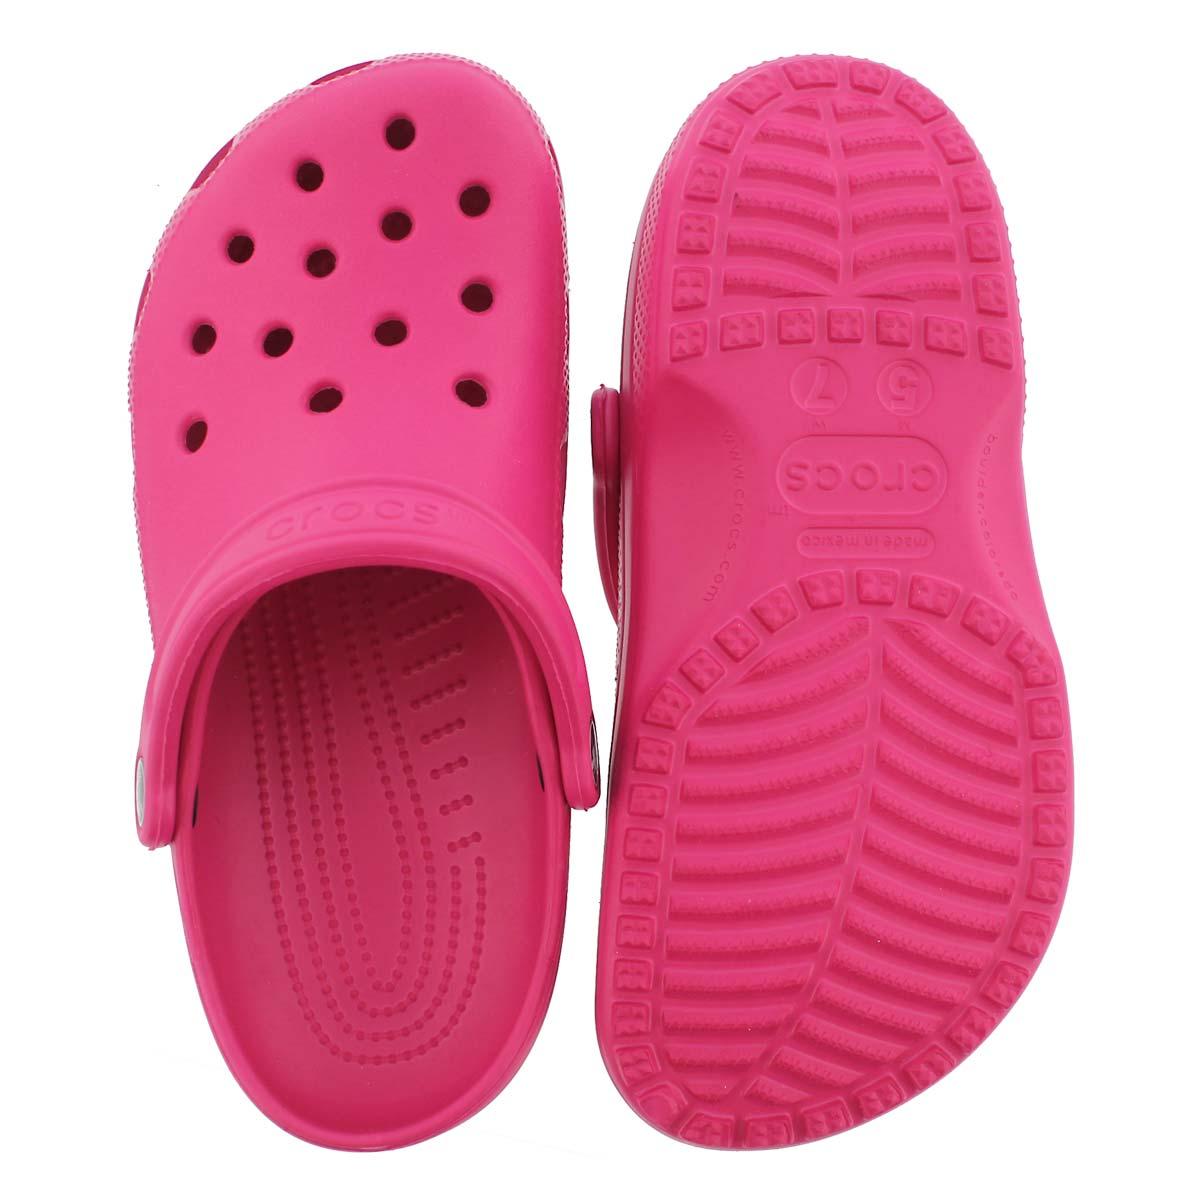 Lds Classic candy pink EVA comfort clog